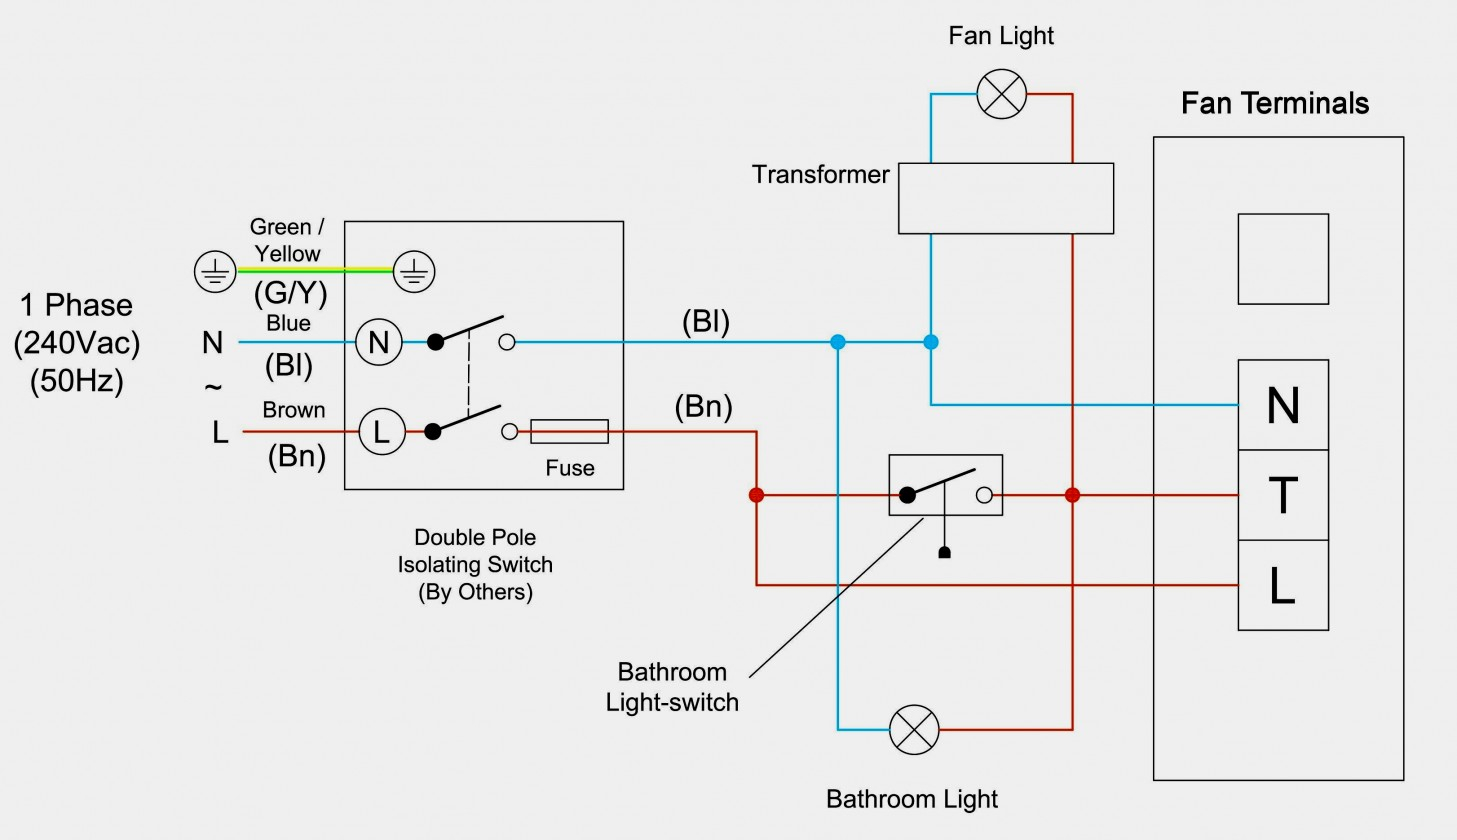 Bathroom Fan Isolator Switch Wiring Diagram - Schematics Wiring Diagram - Wiring A Bathroom Fan And Light Diagram